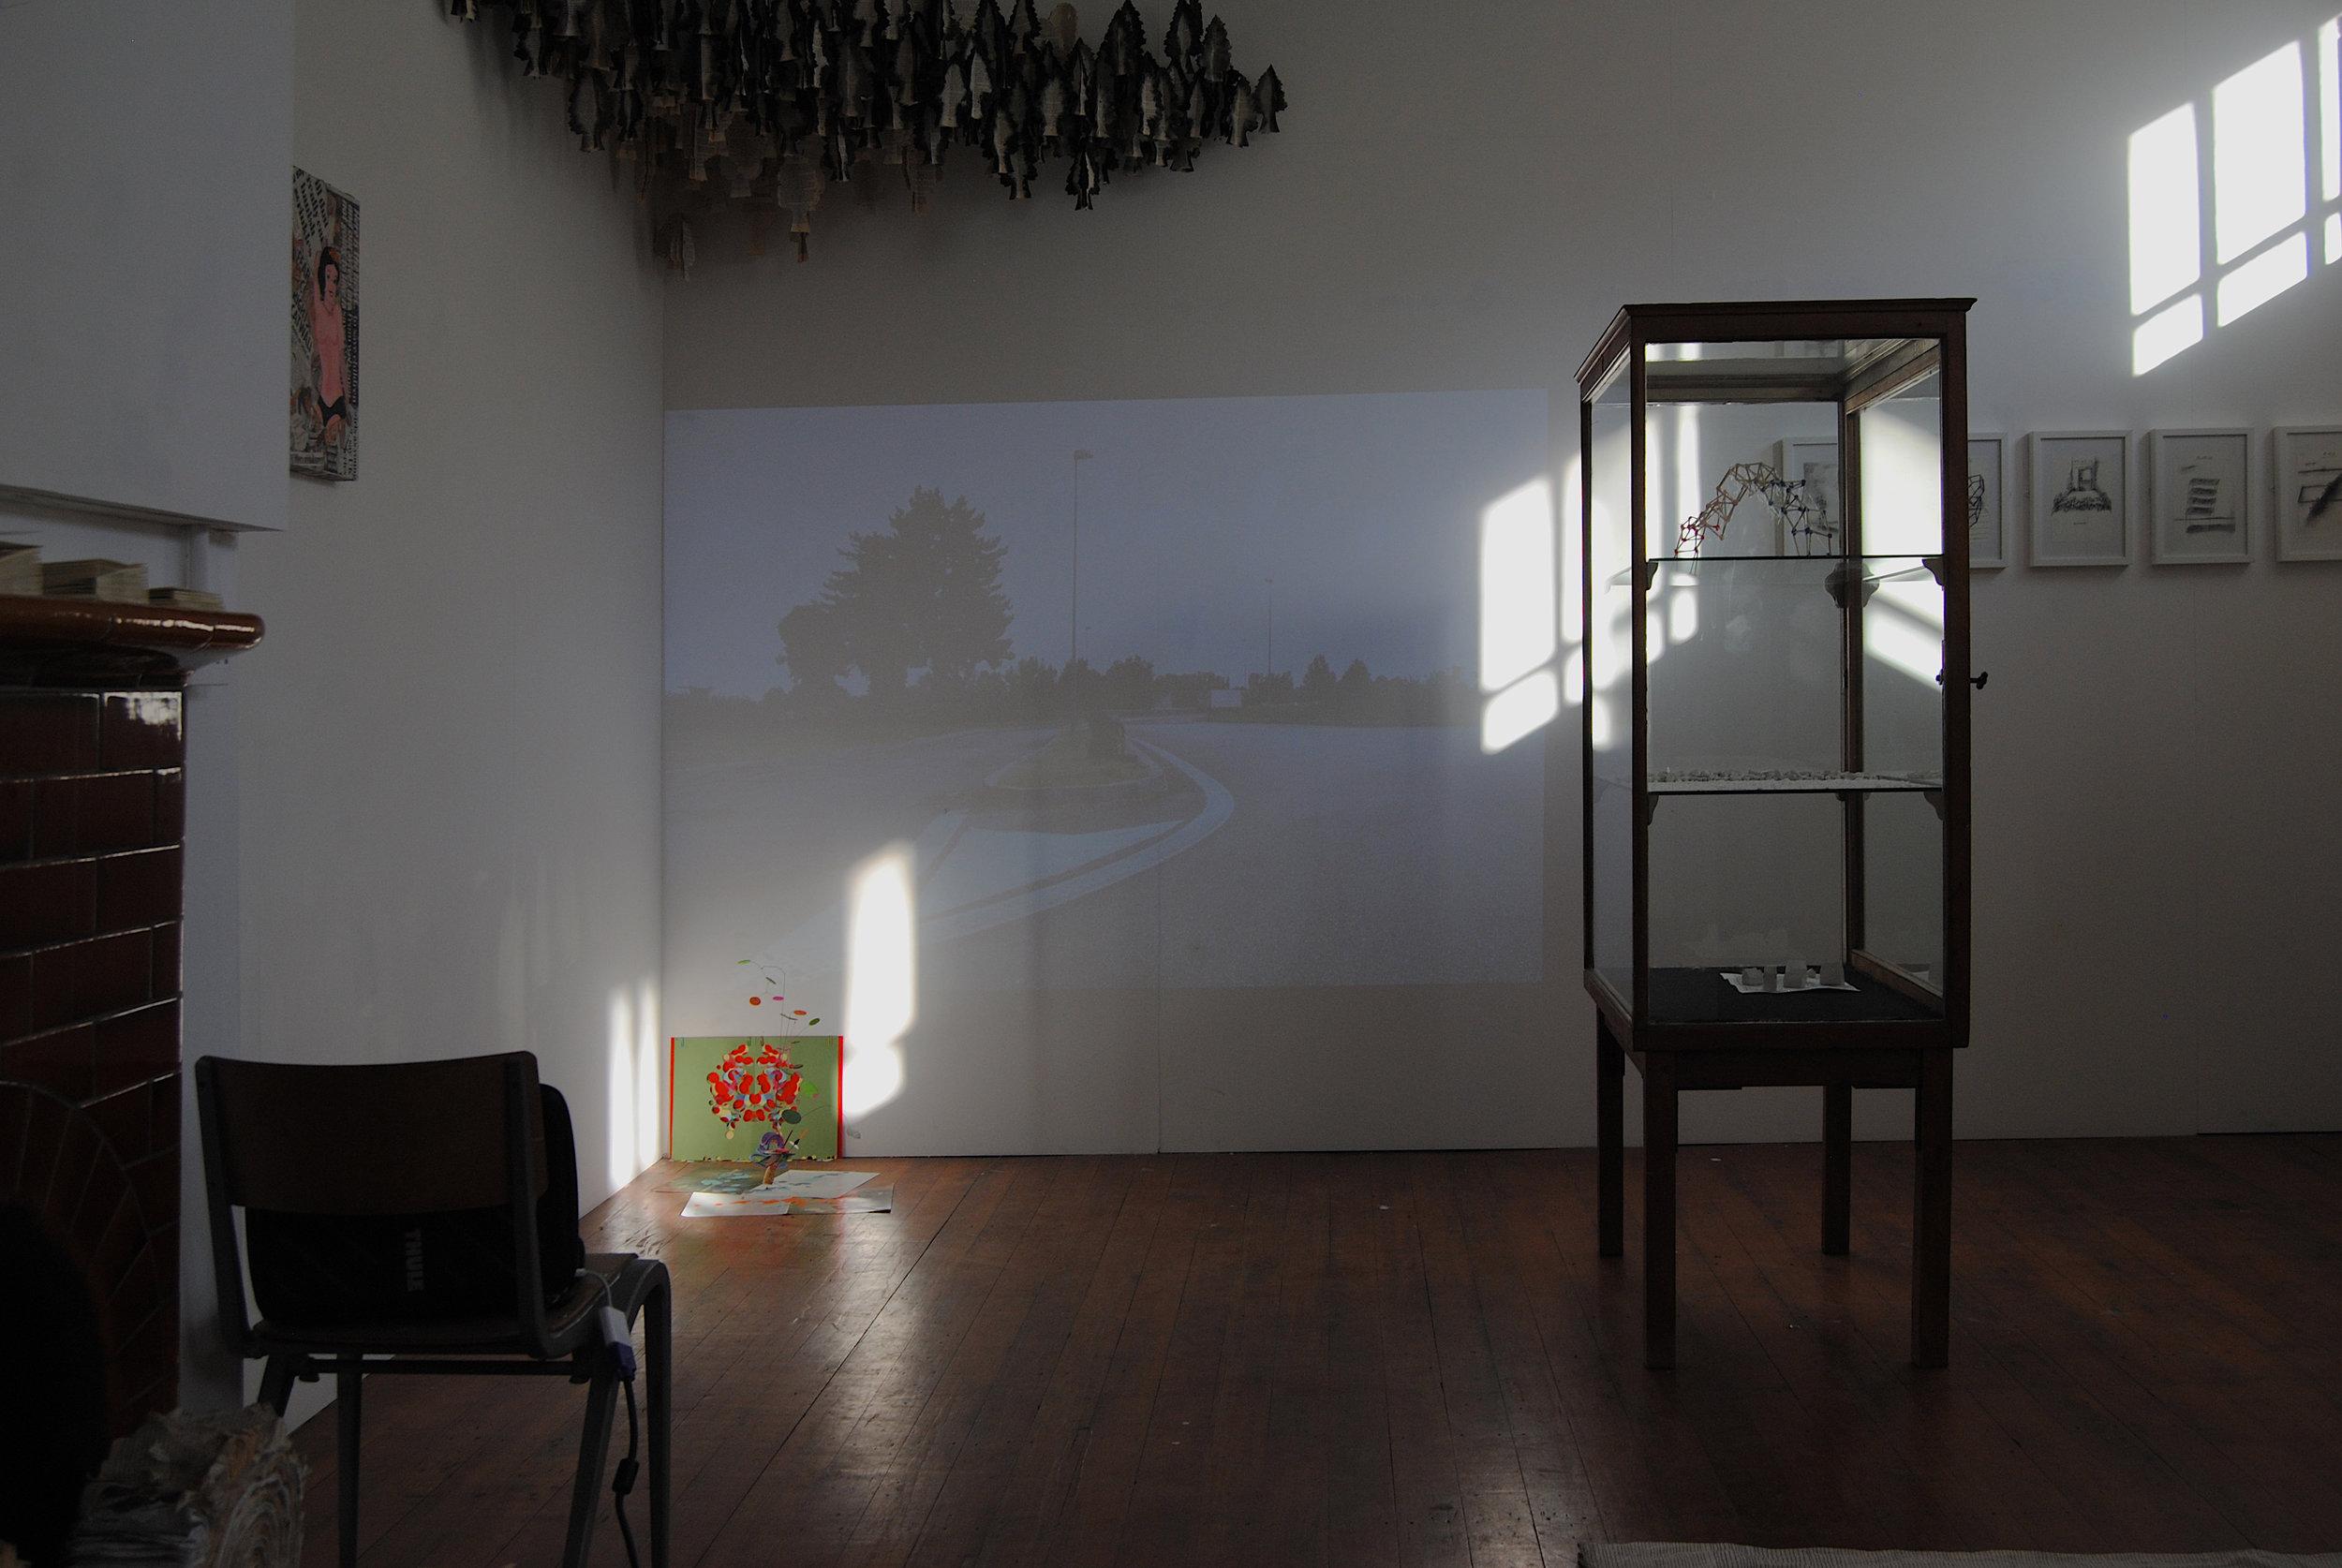 INHOSPITABLE   Liverpool Biennial   October 2012